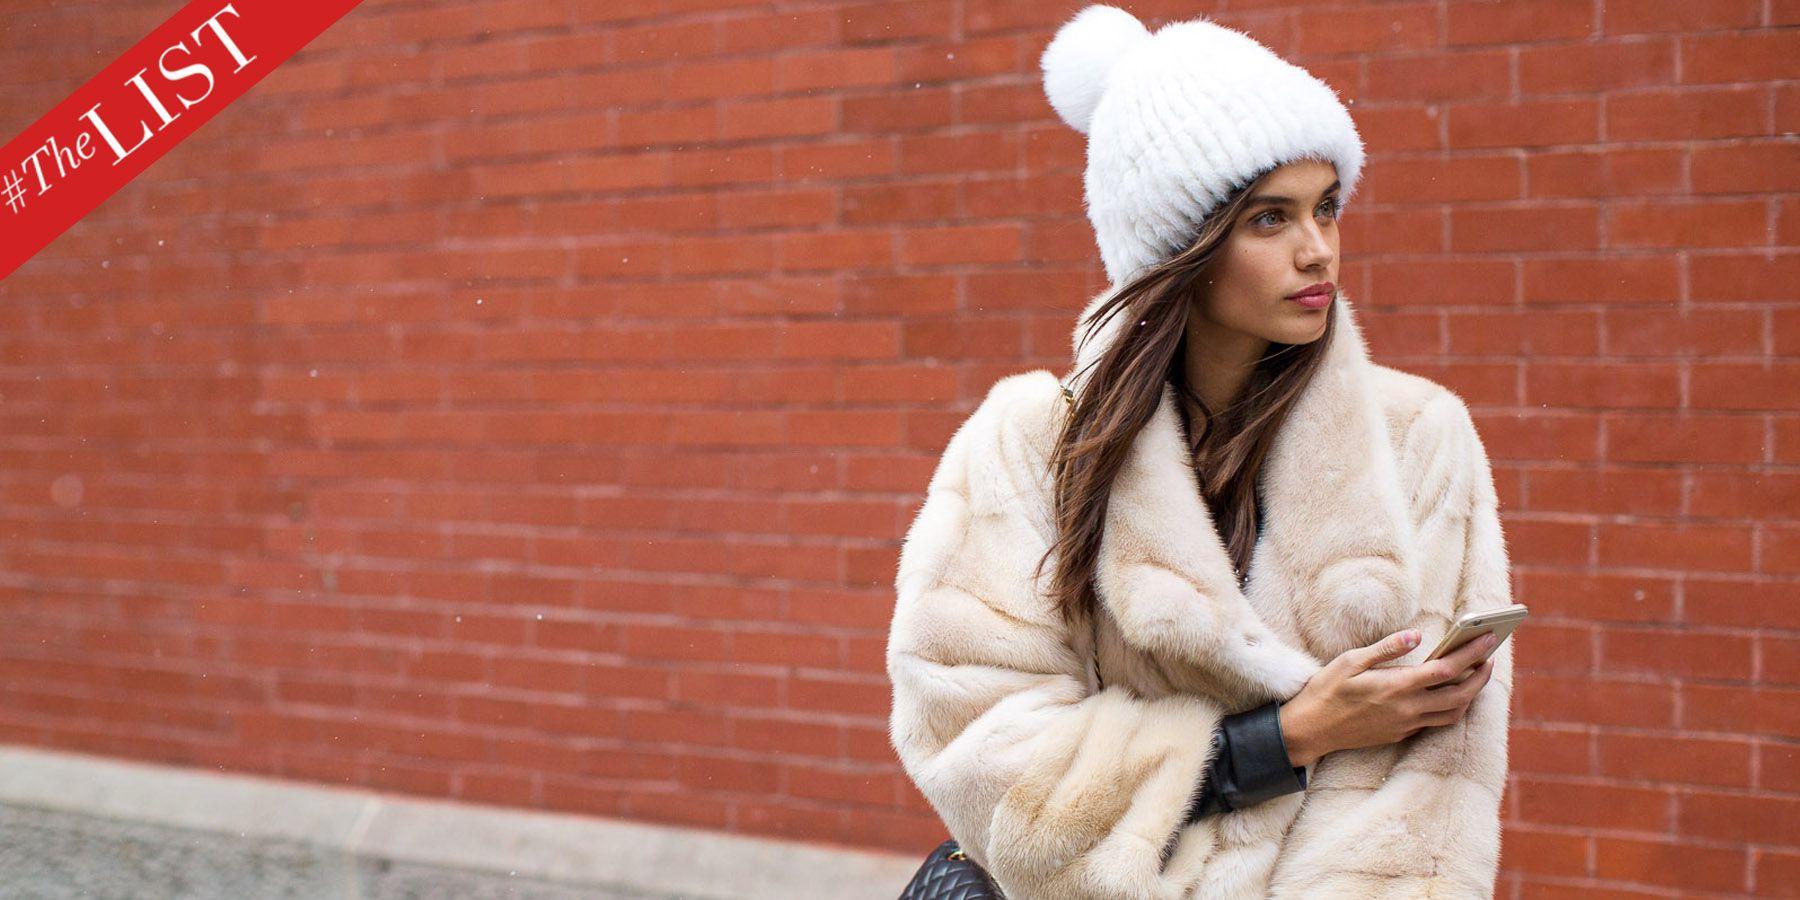 baffffd84 Winter Beanie Hats - Stylish Winter Hats